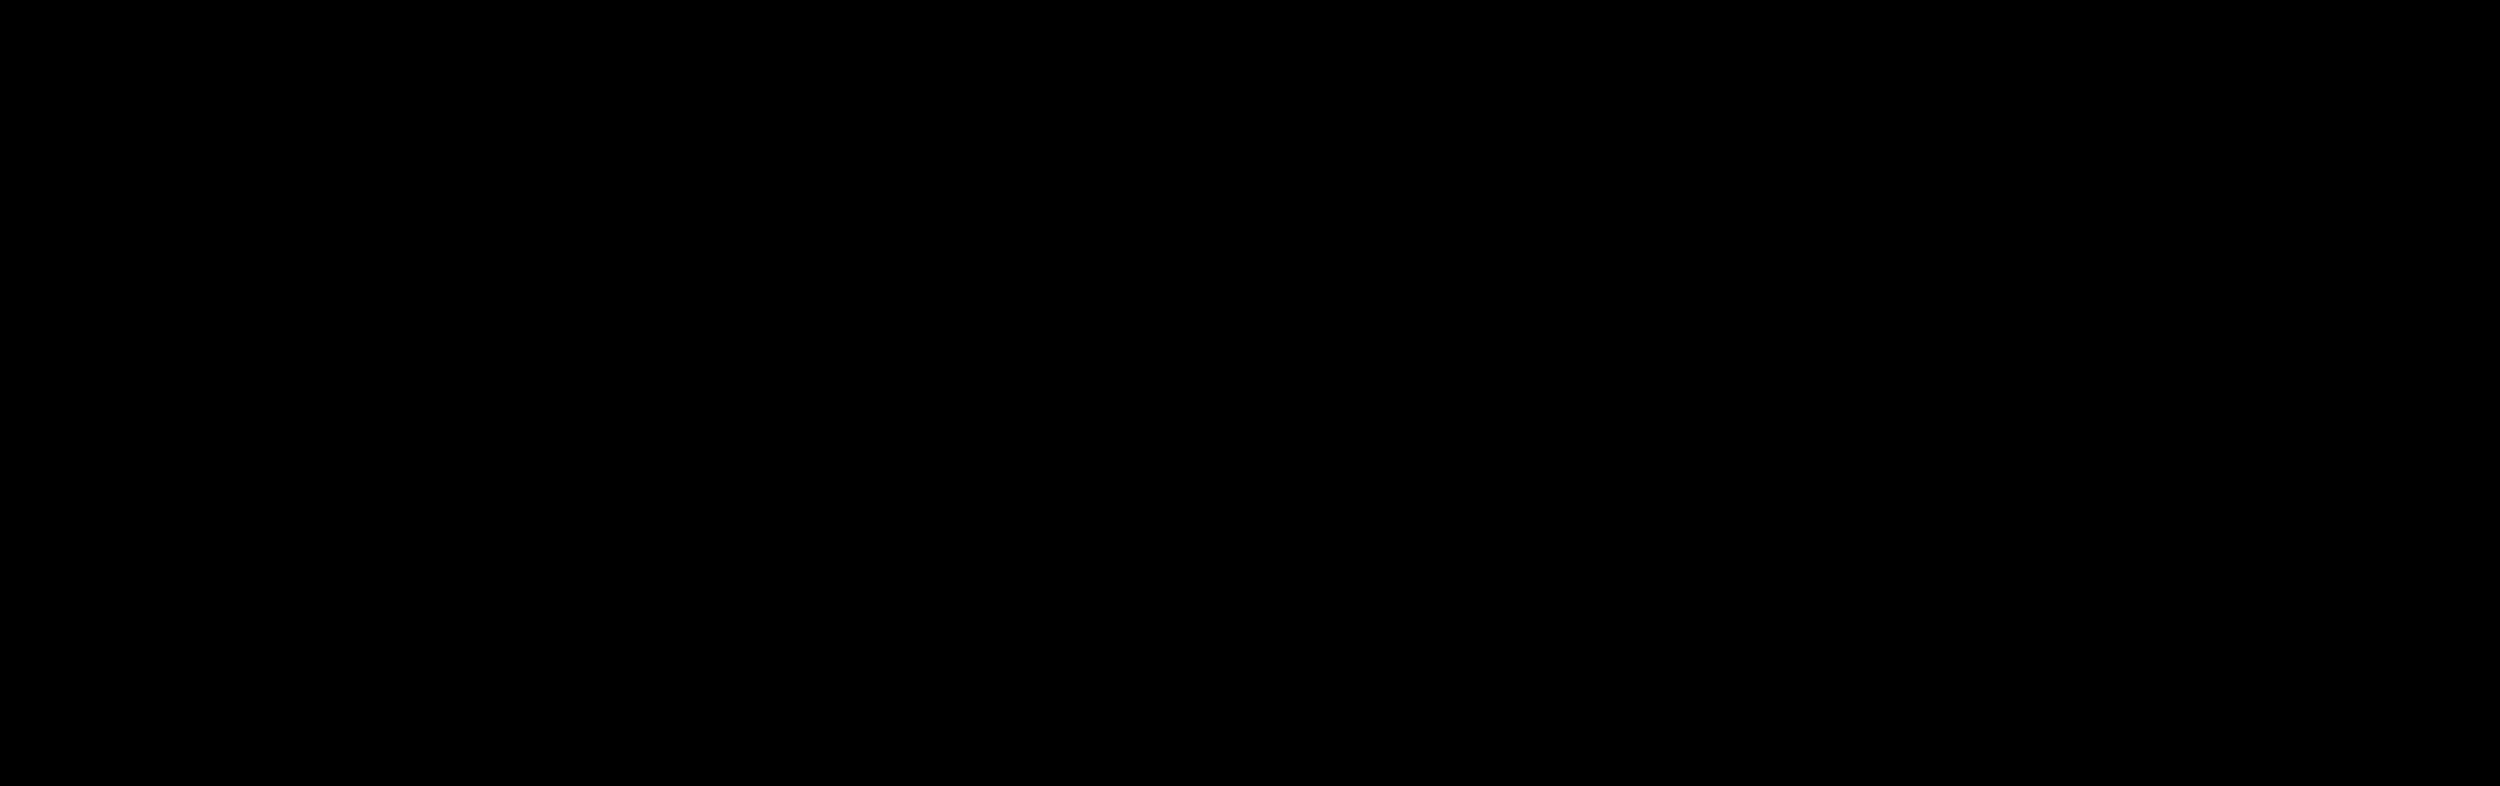 GOAL CLICK LOGOS-LOCKUP BLACK.png